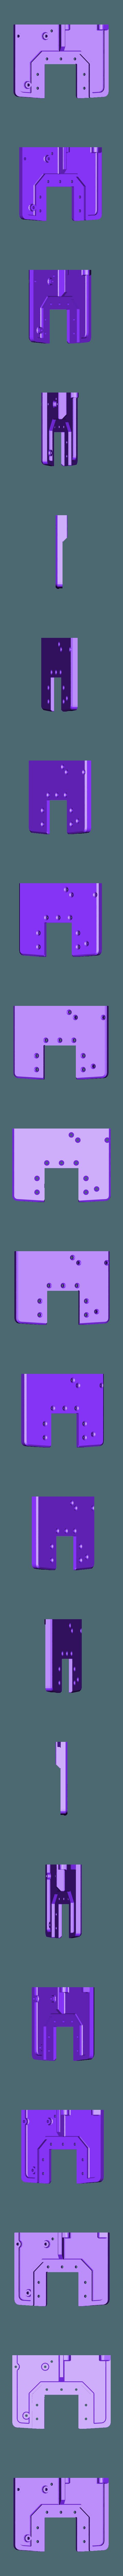 Rear Frame.STL Download free STL file 1/10 RC 4WD TRUGGY BT250.2 • 3D printer object, ivnssnn